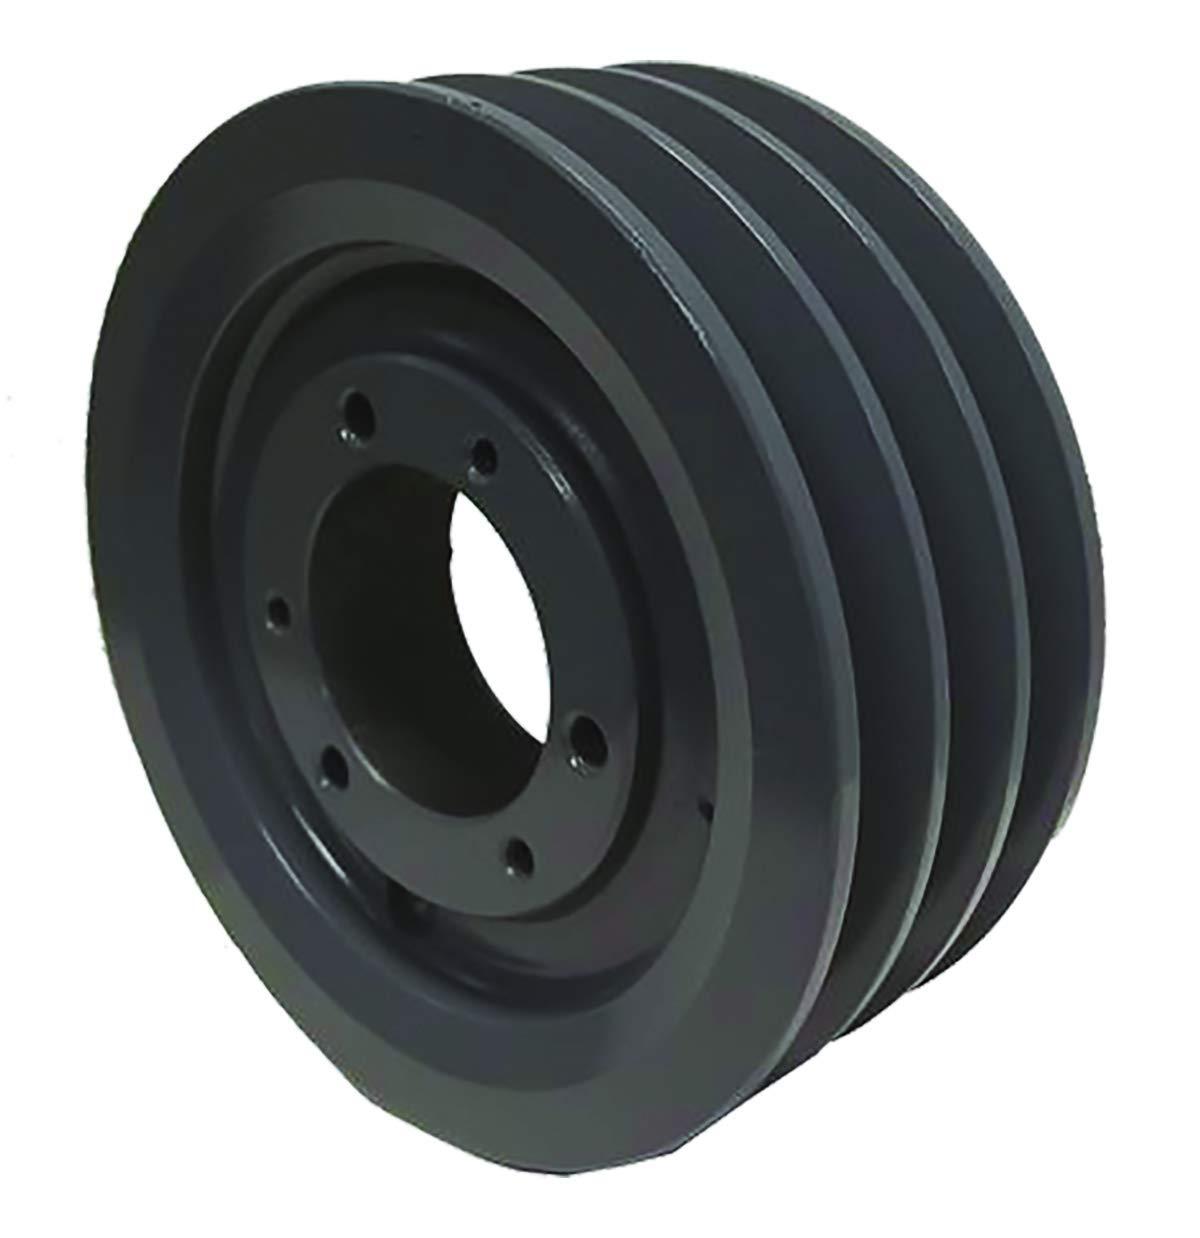 Powerhouse HTD 3B200SF V-Belt Pulley, Cast Iron